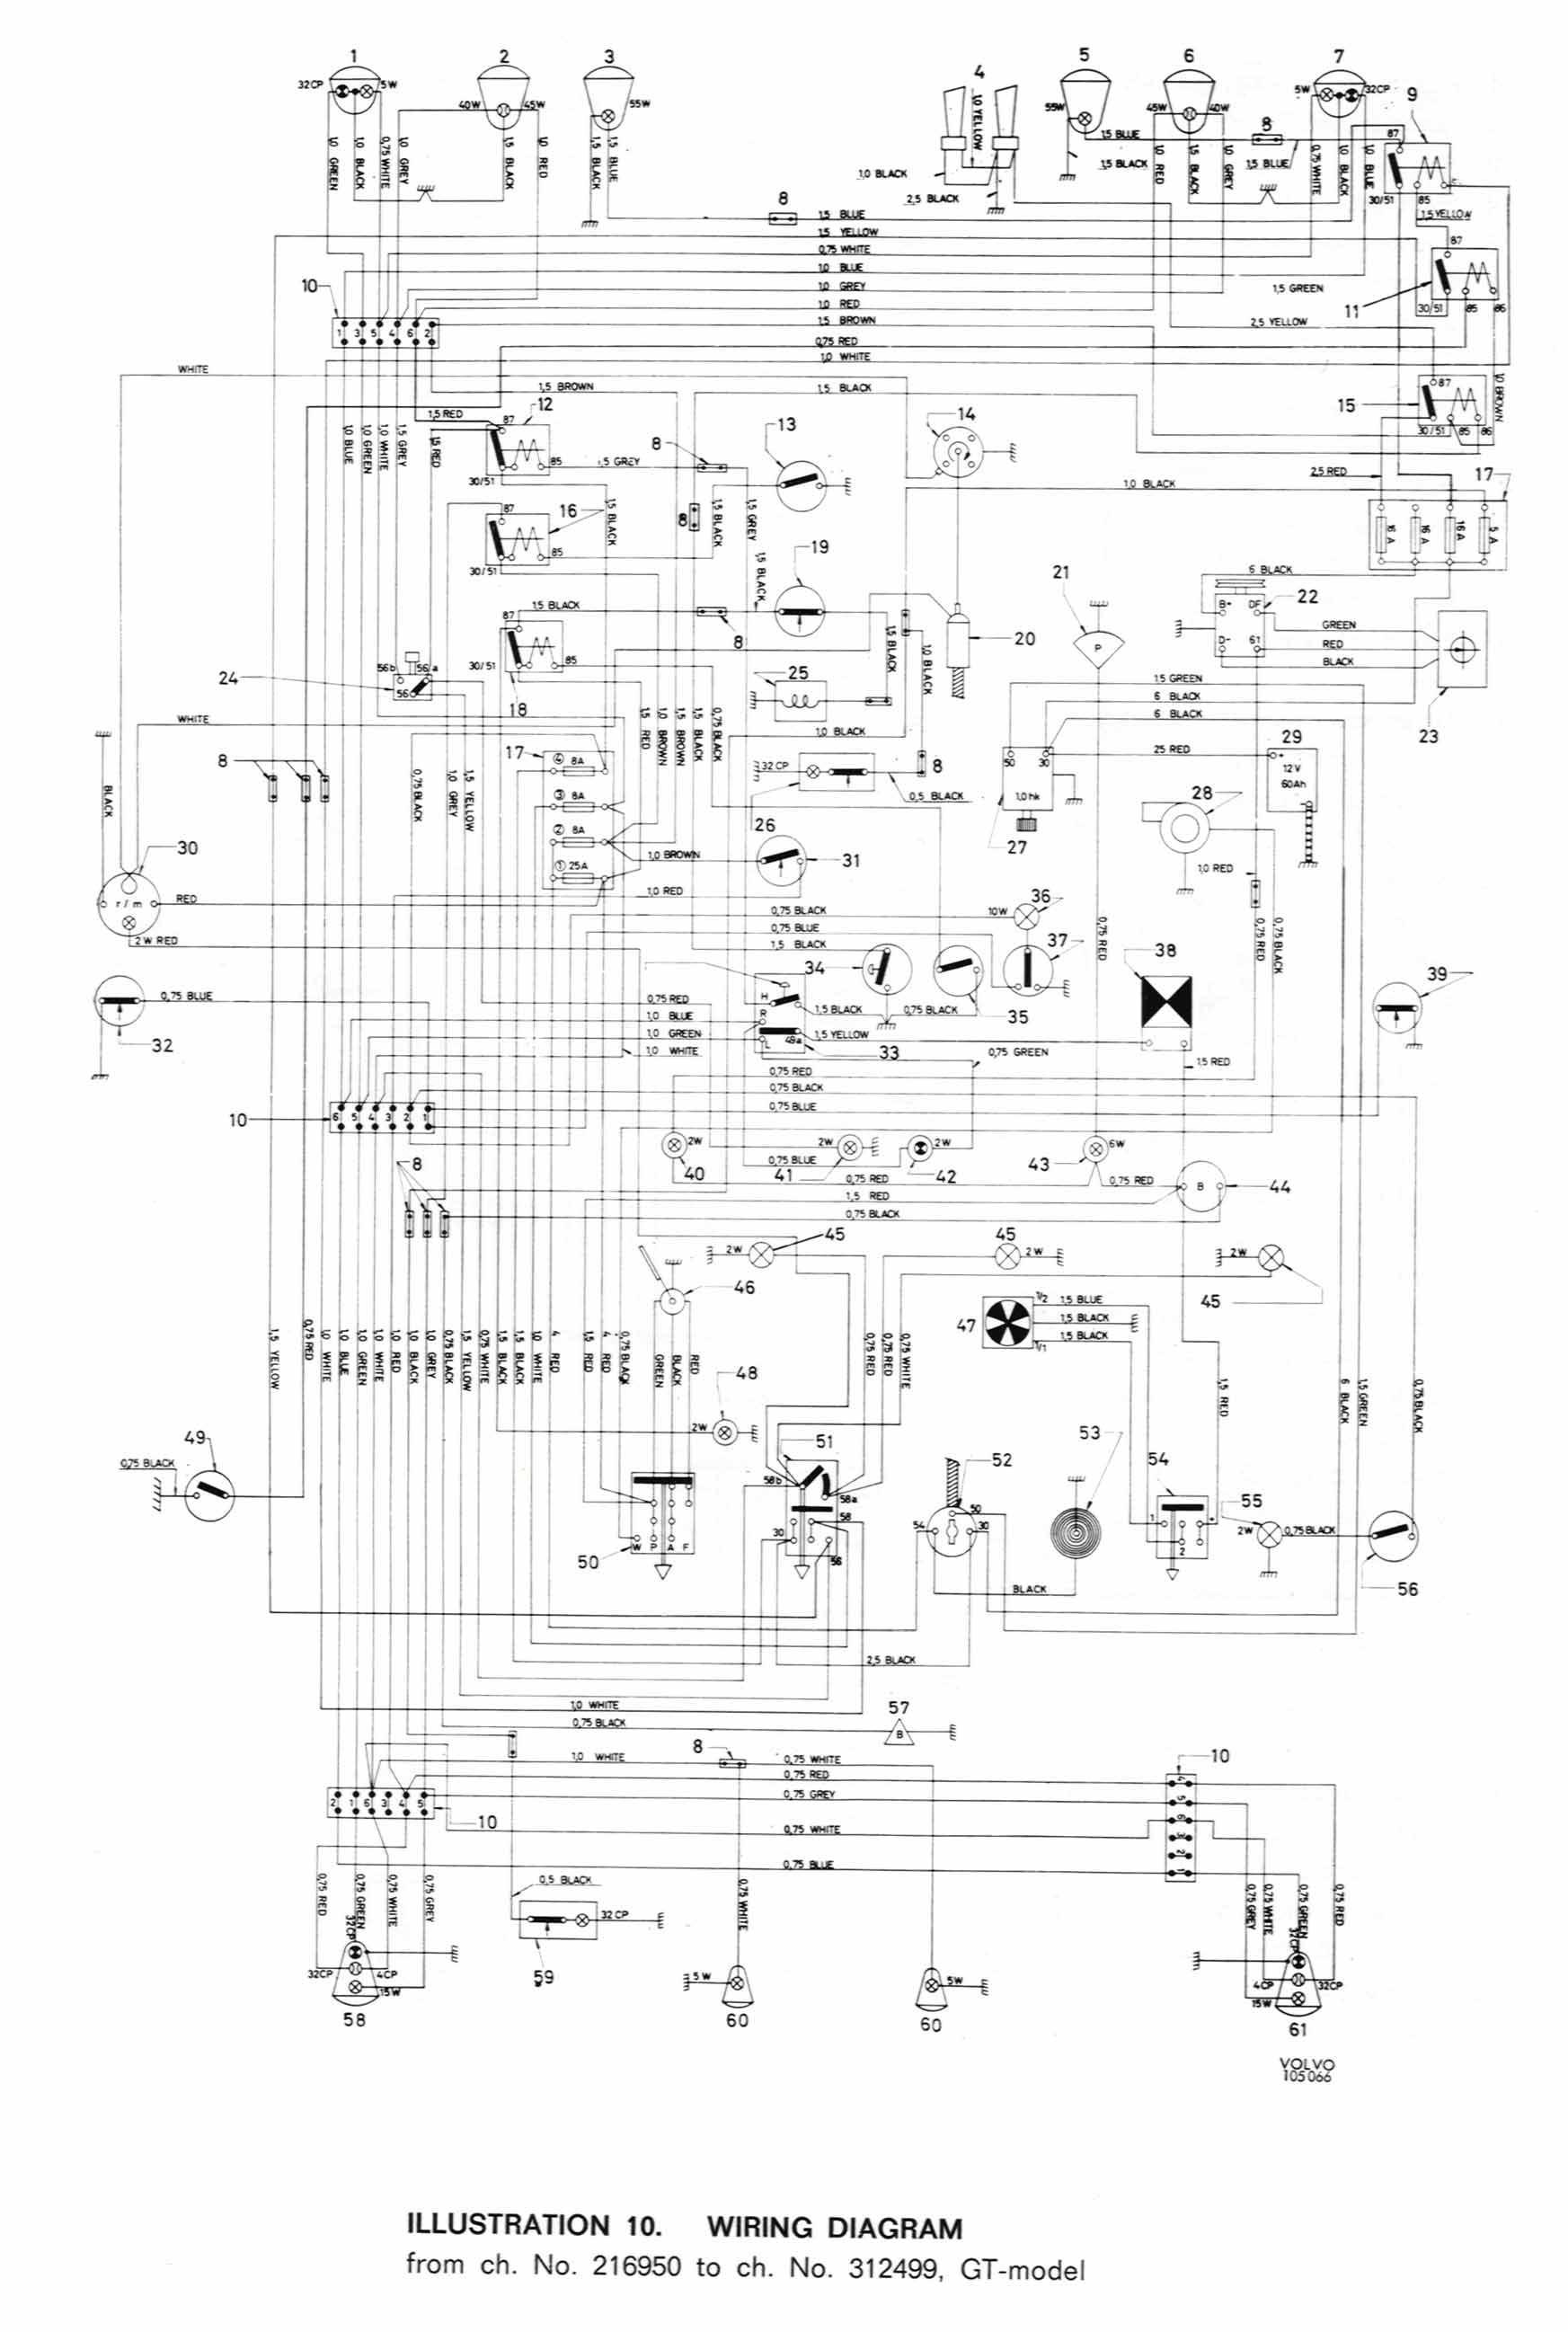 Autometer Tach Wiring Diagram - Roslonek.net